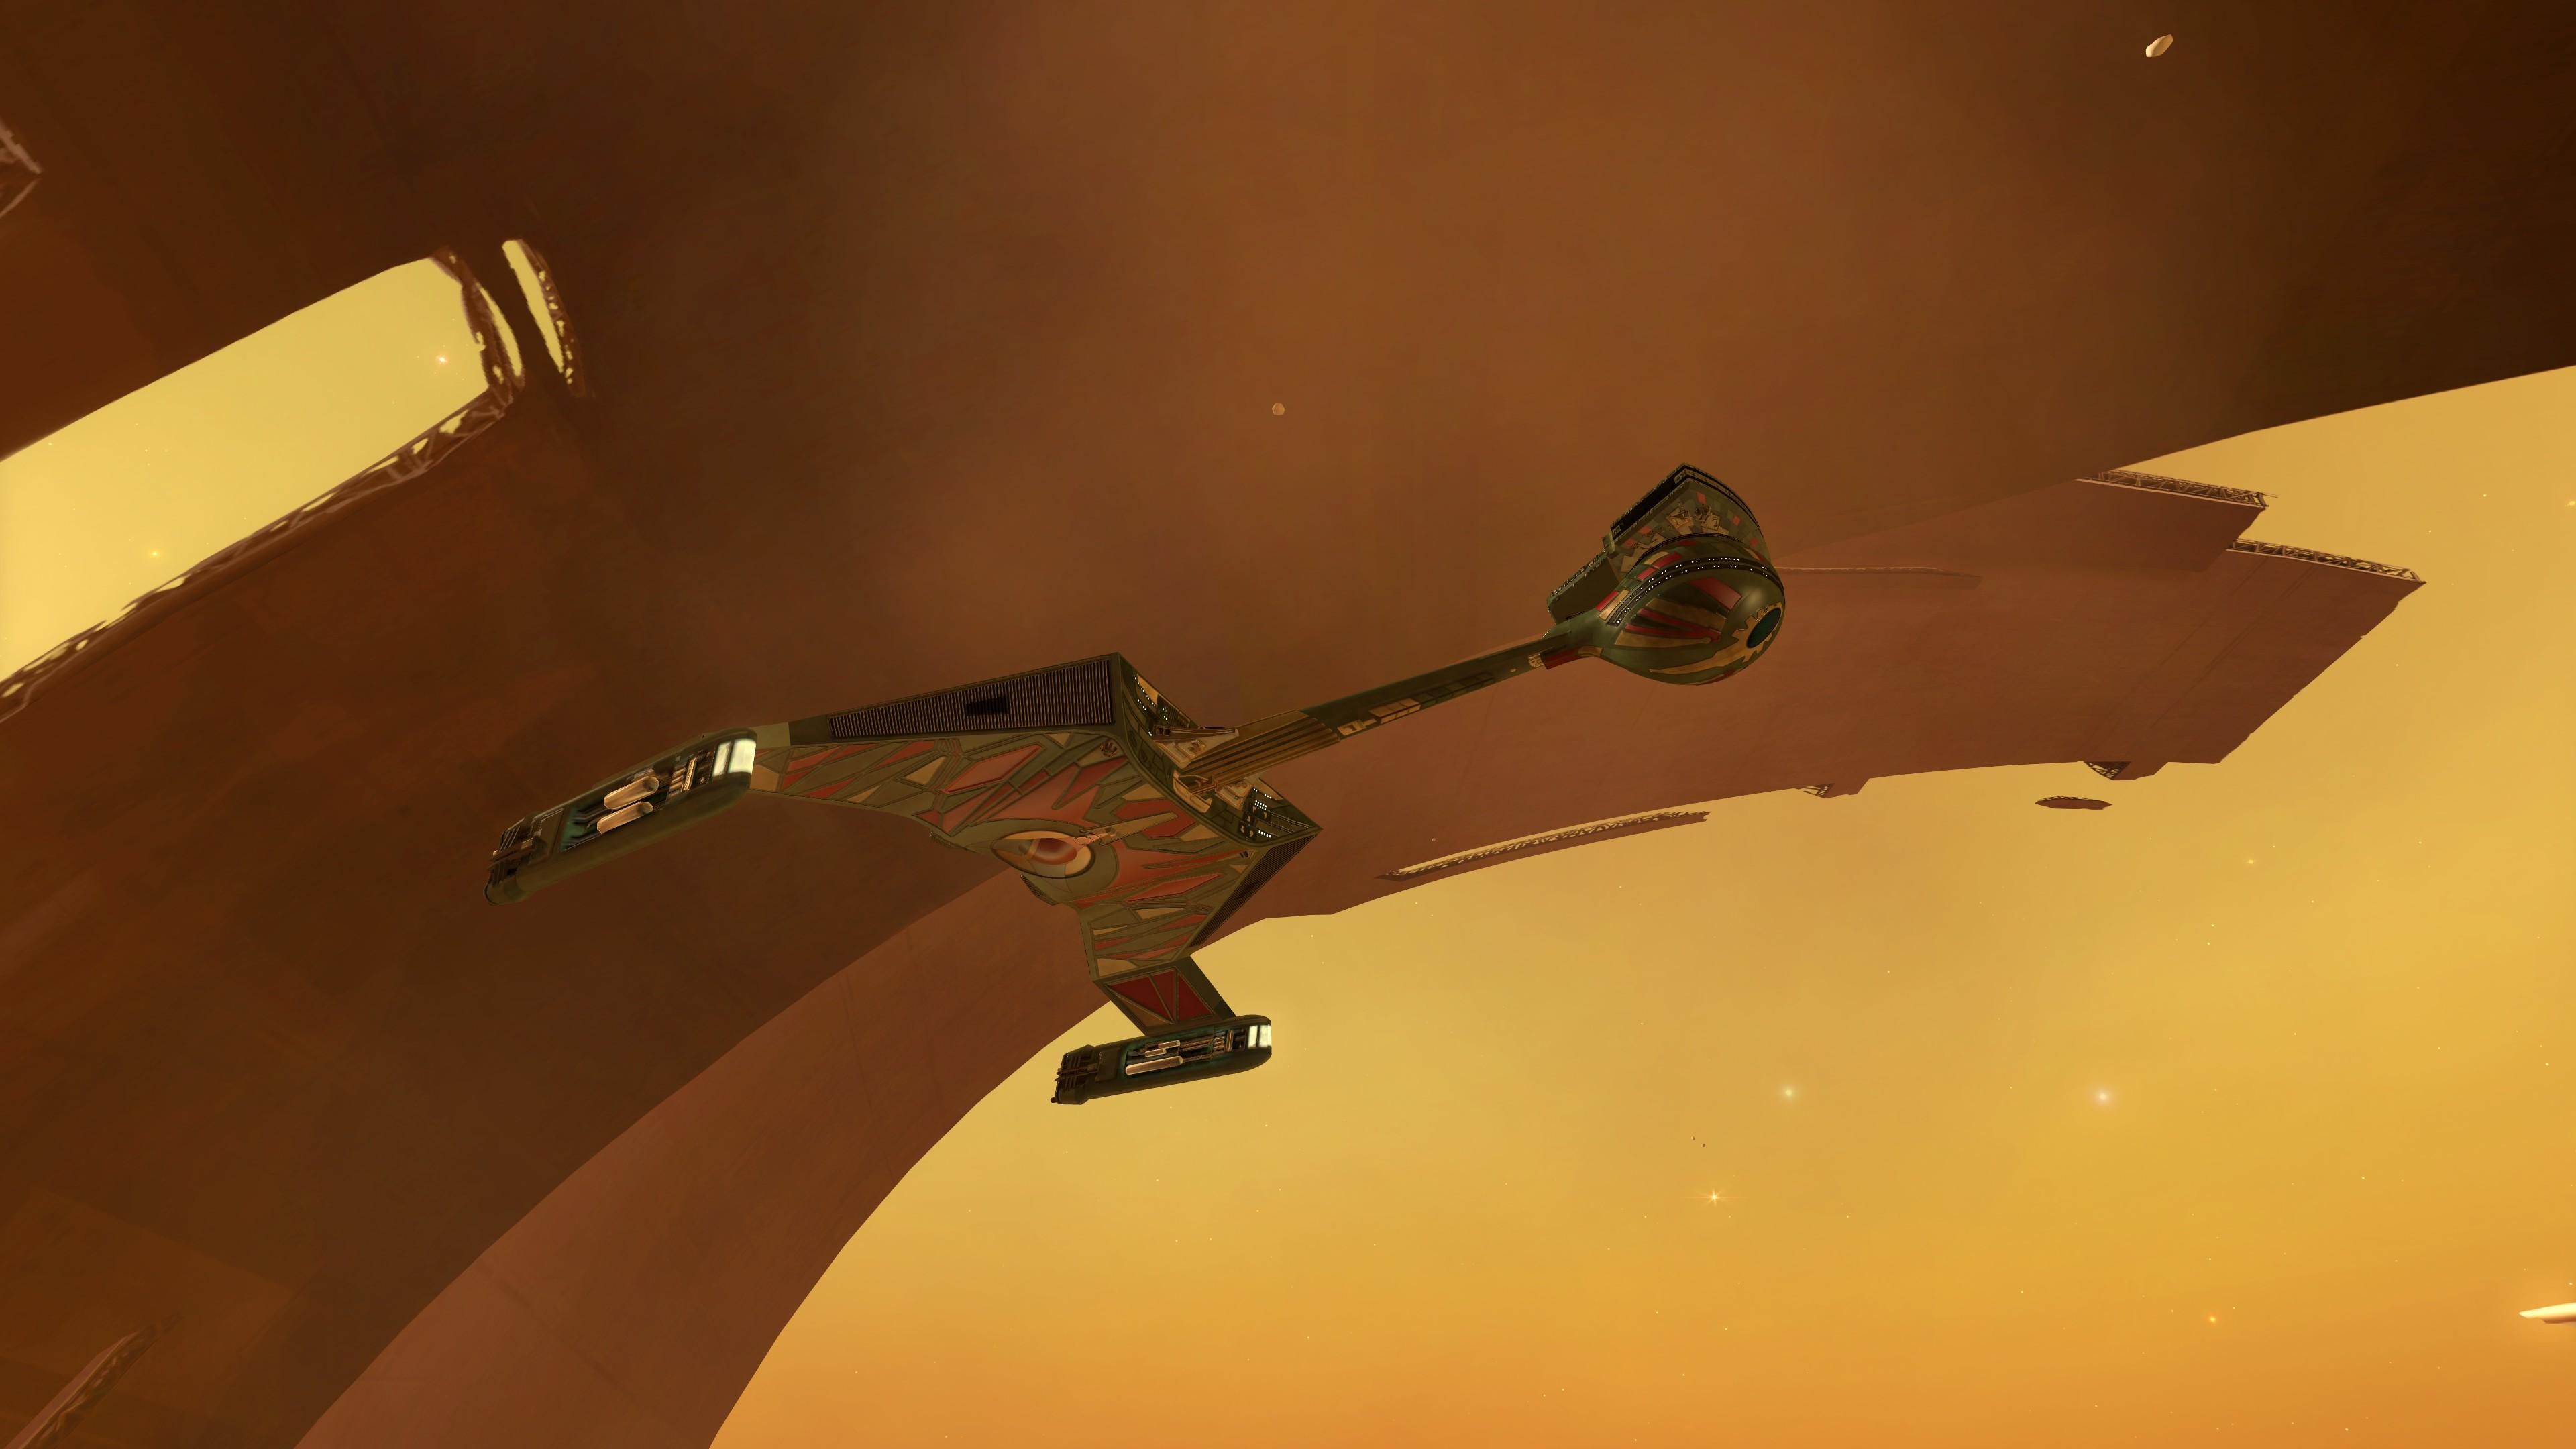 4K HS Screenshots image - Star Trek: Continuum Remastered